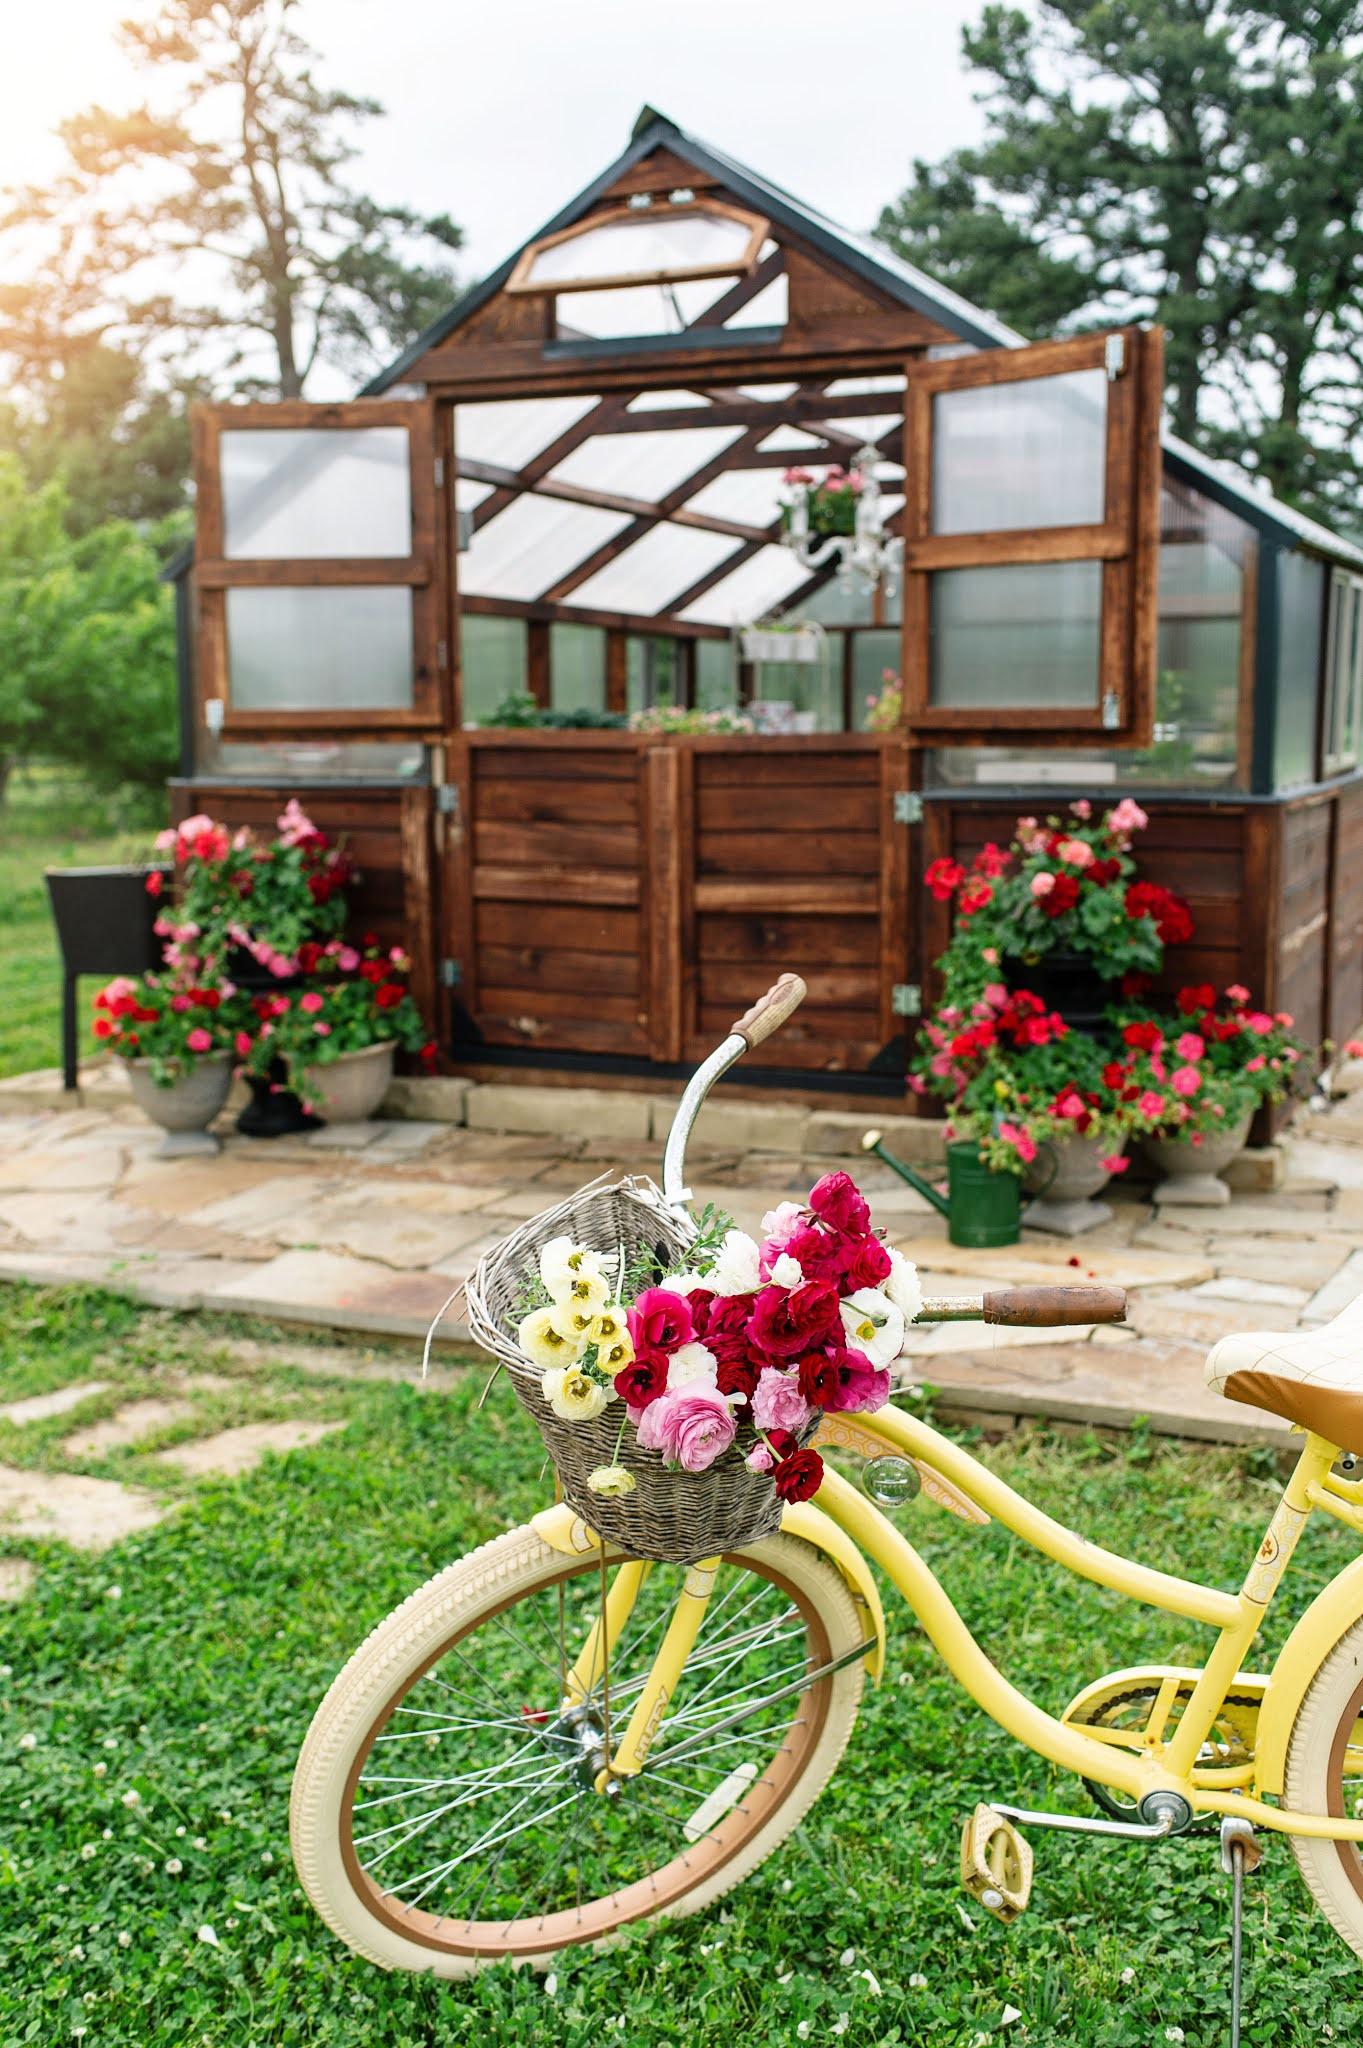 Yoderbilt Greenhouse Vintage Bike